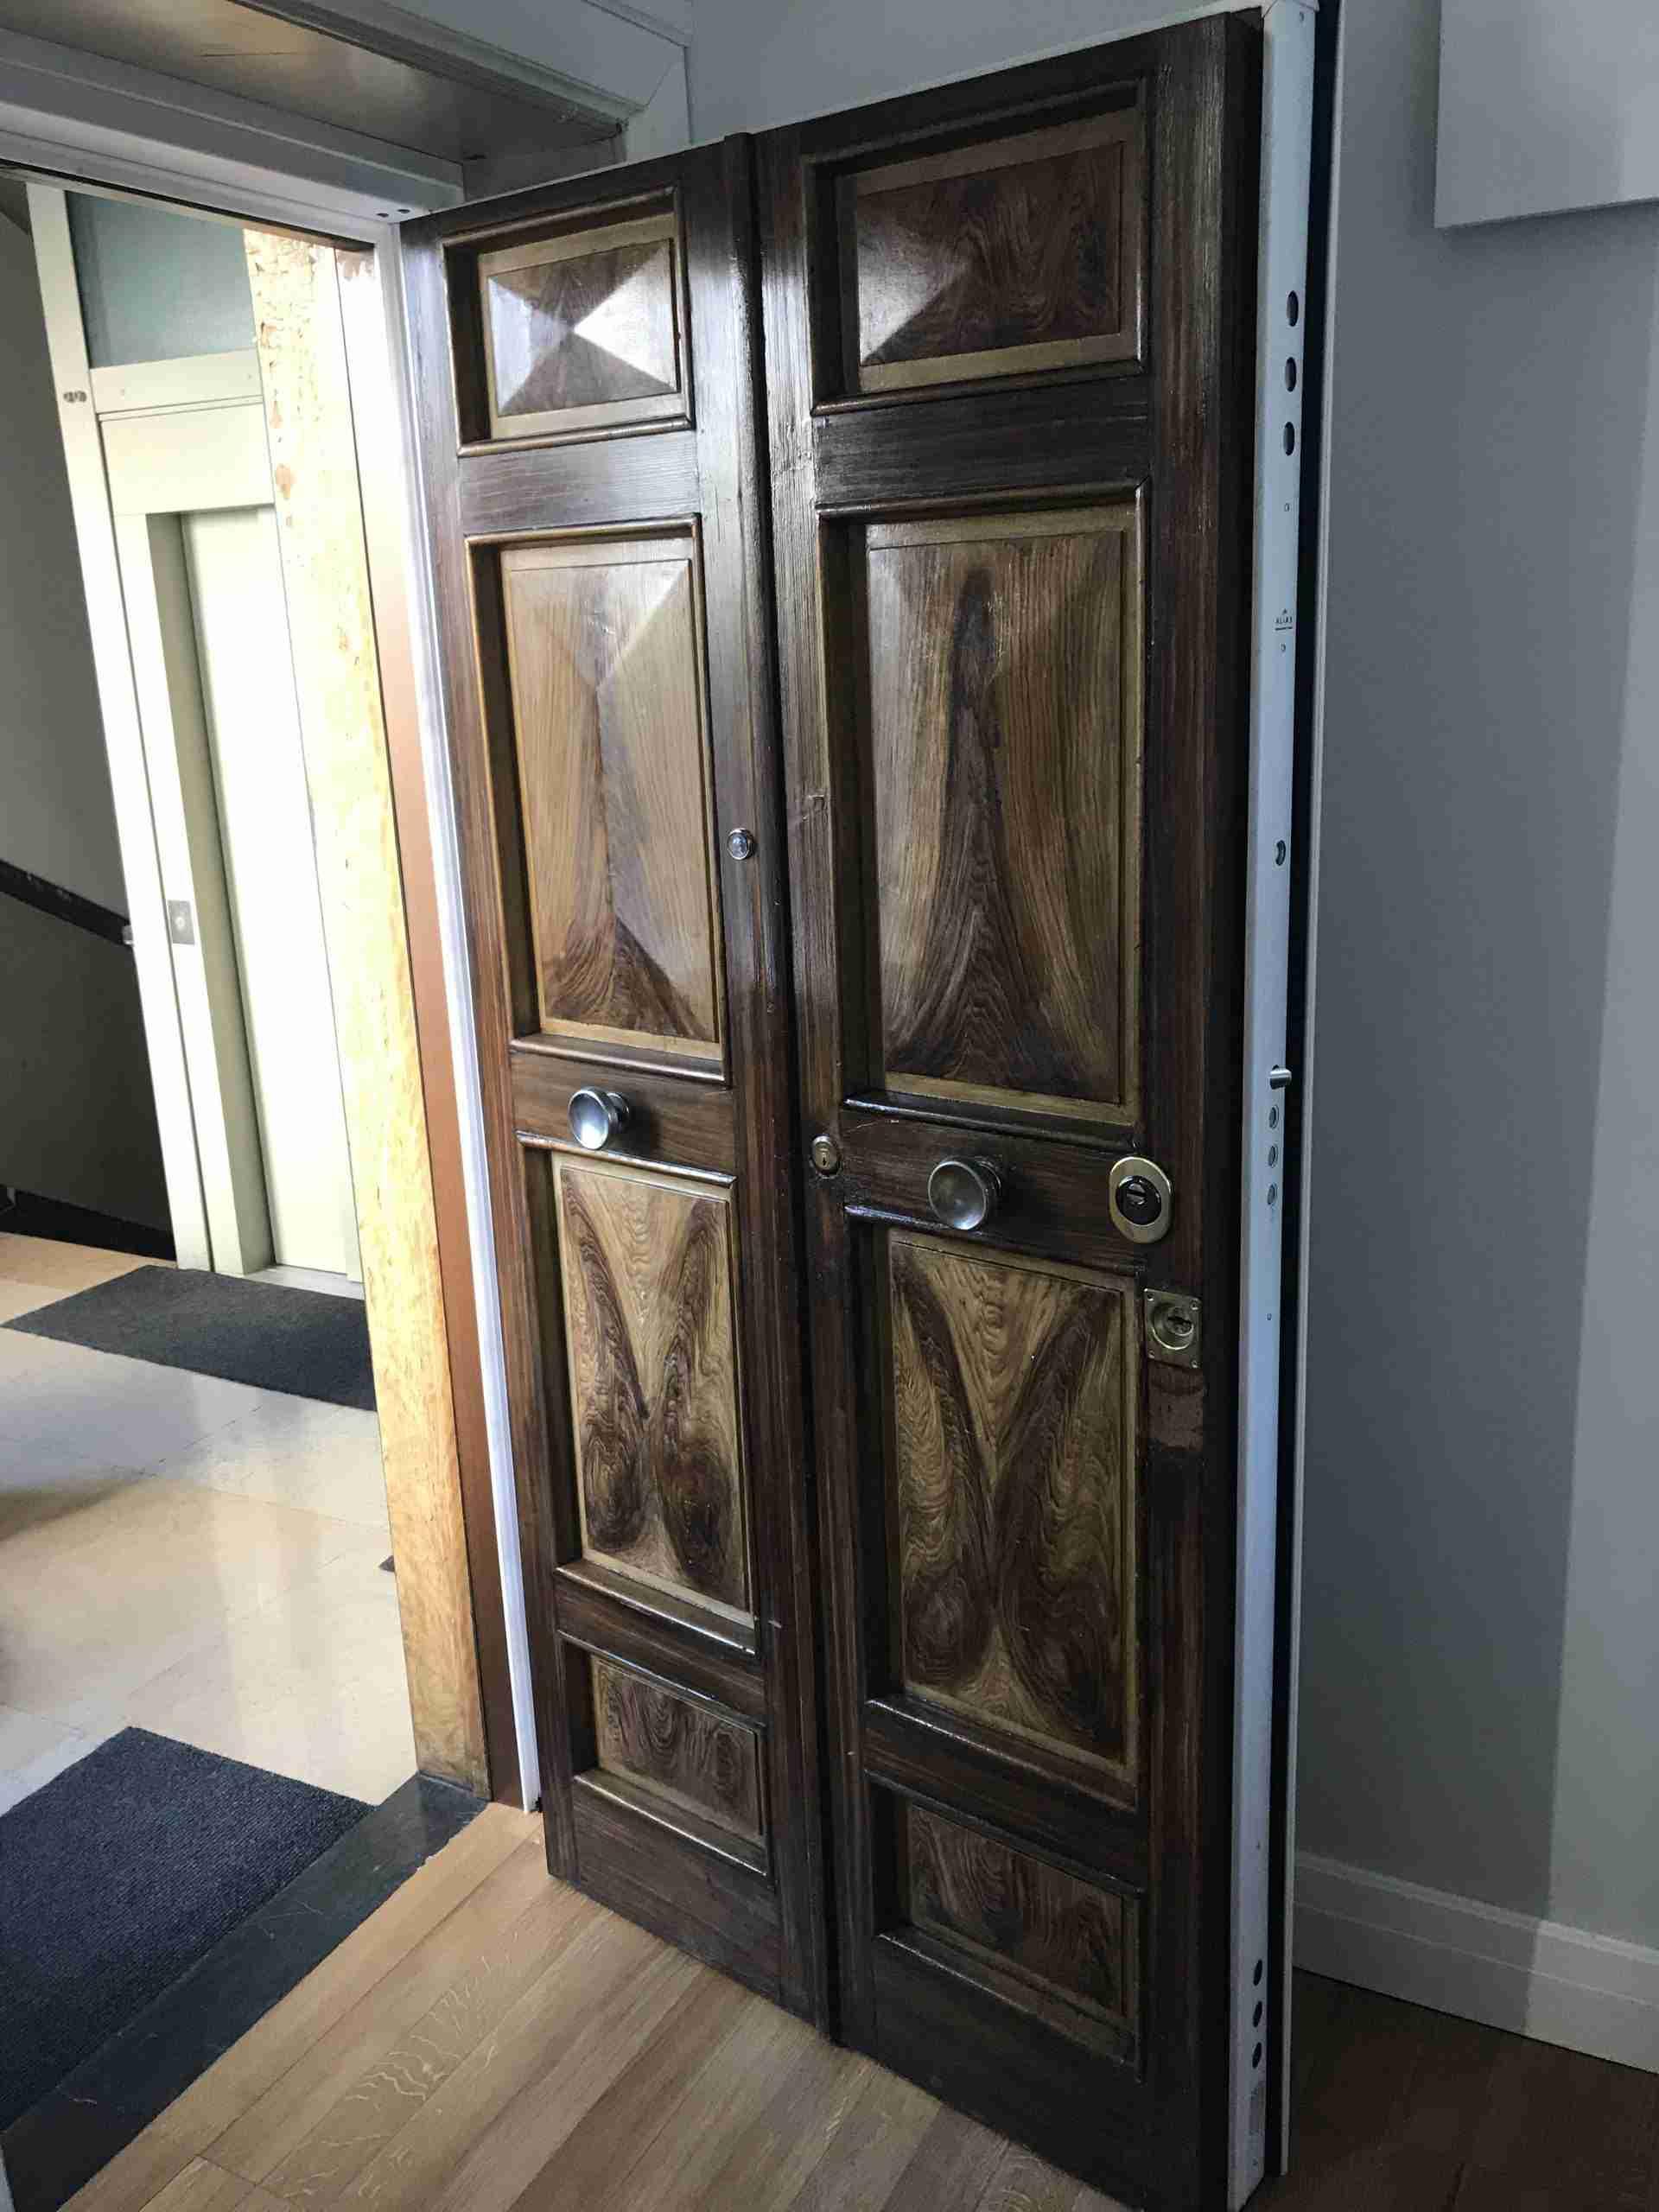 Porta blindata in Centro Storico a verona